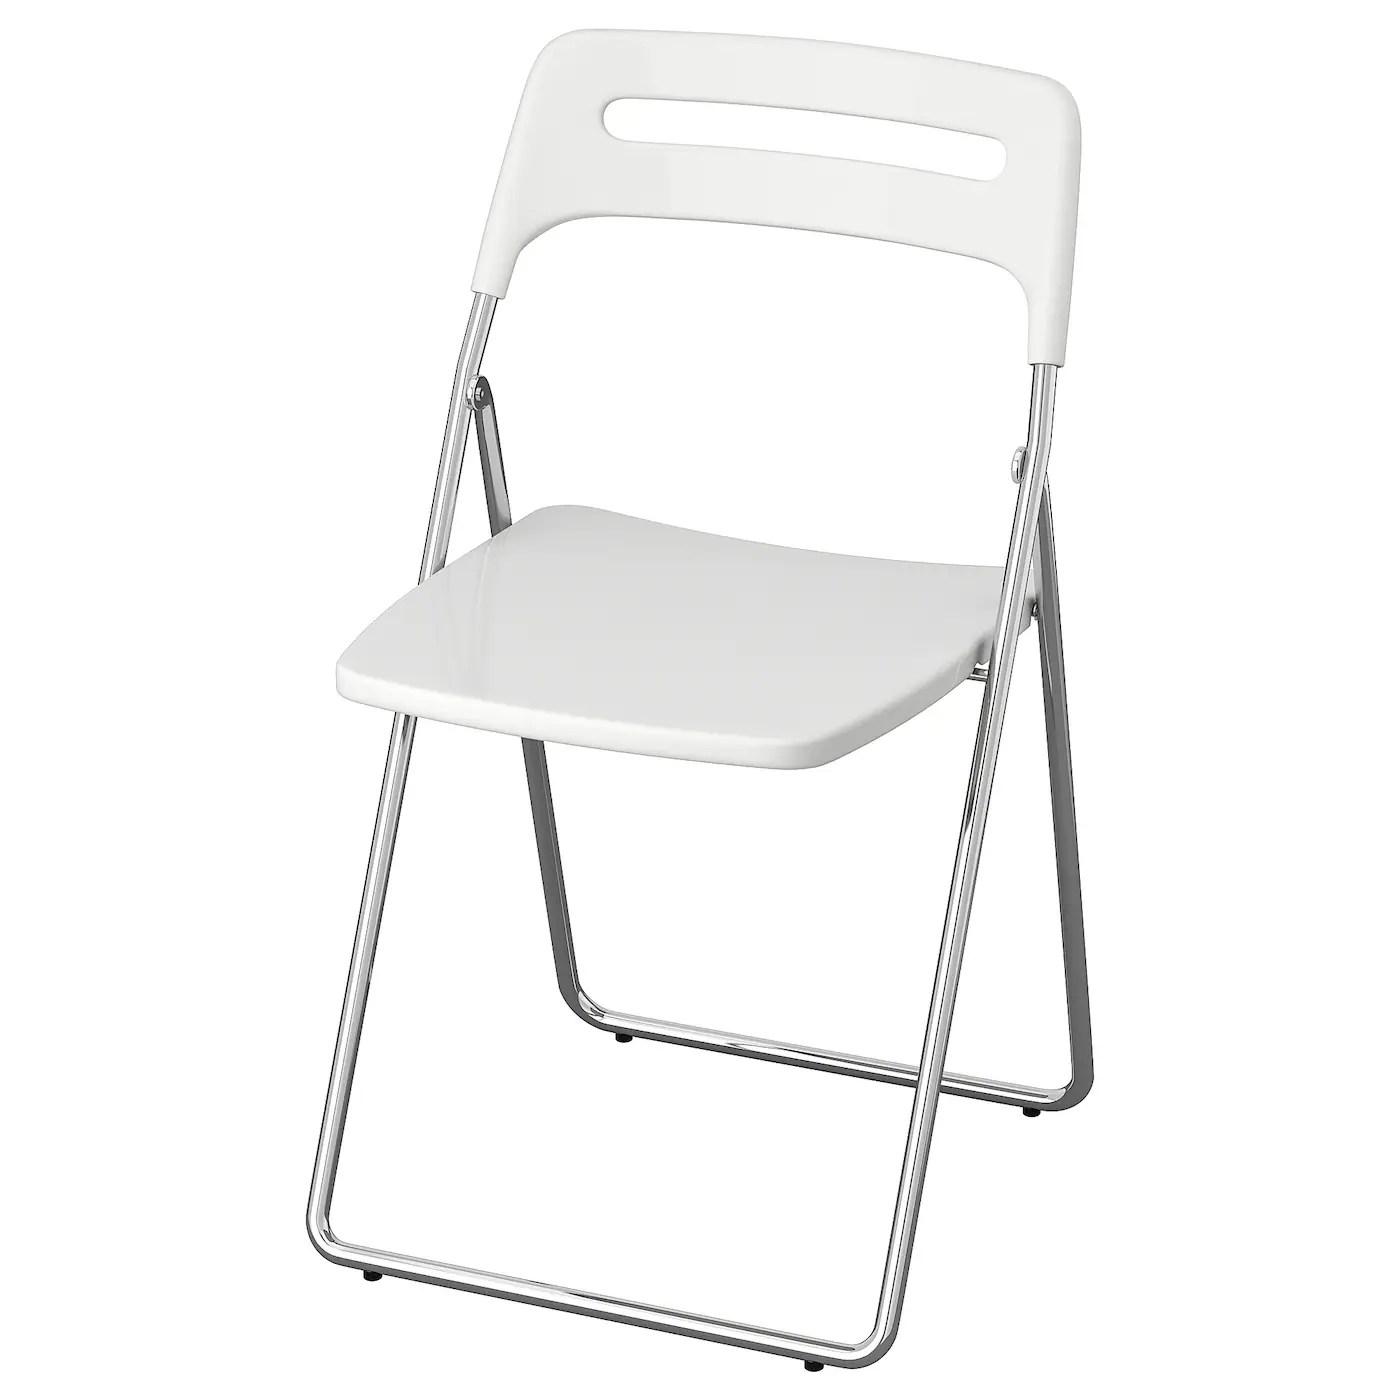 Nisse Chaise Pliante Brillant Blanc Chrome Ikea